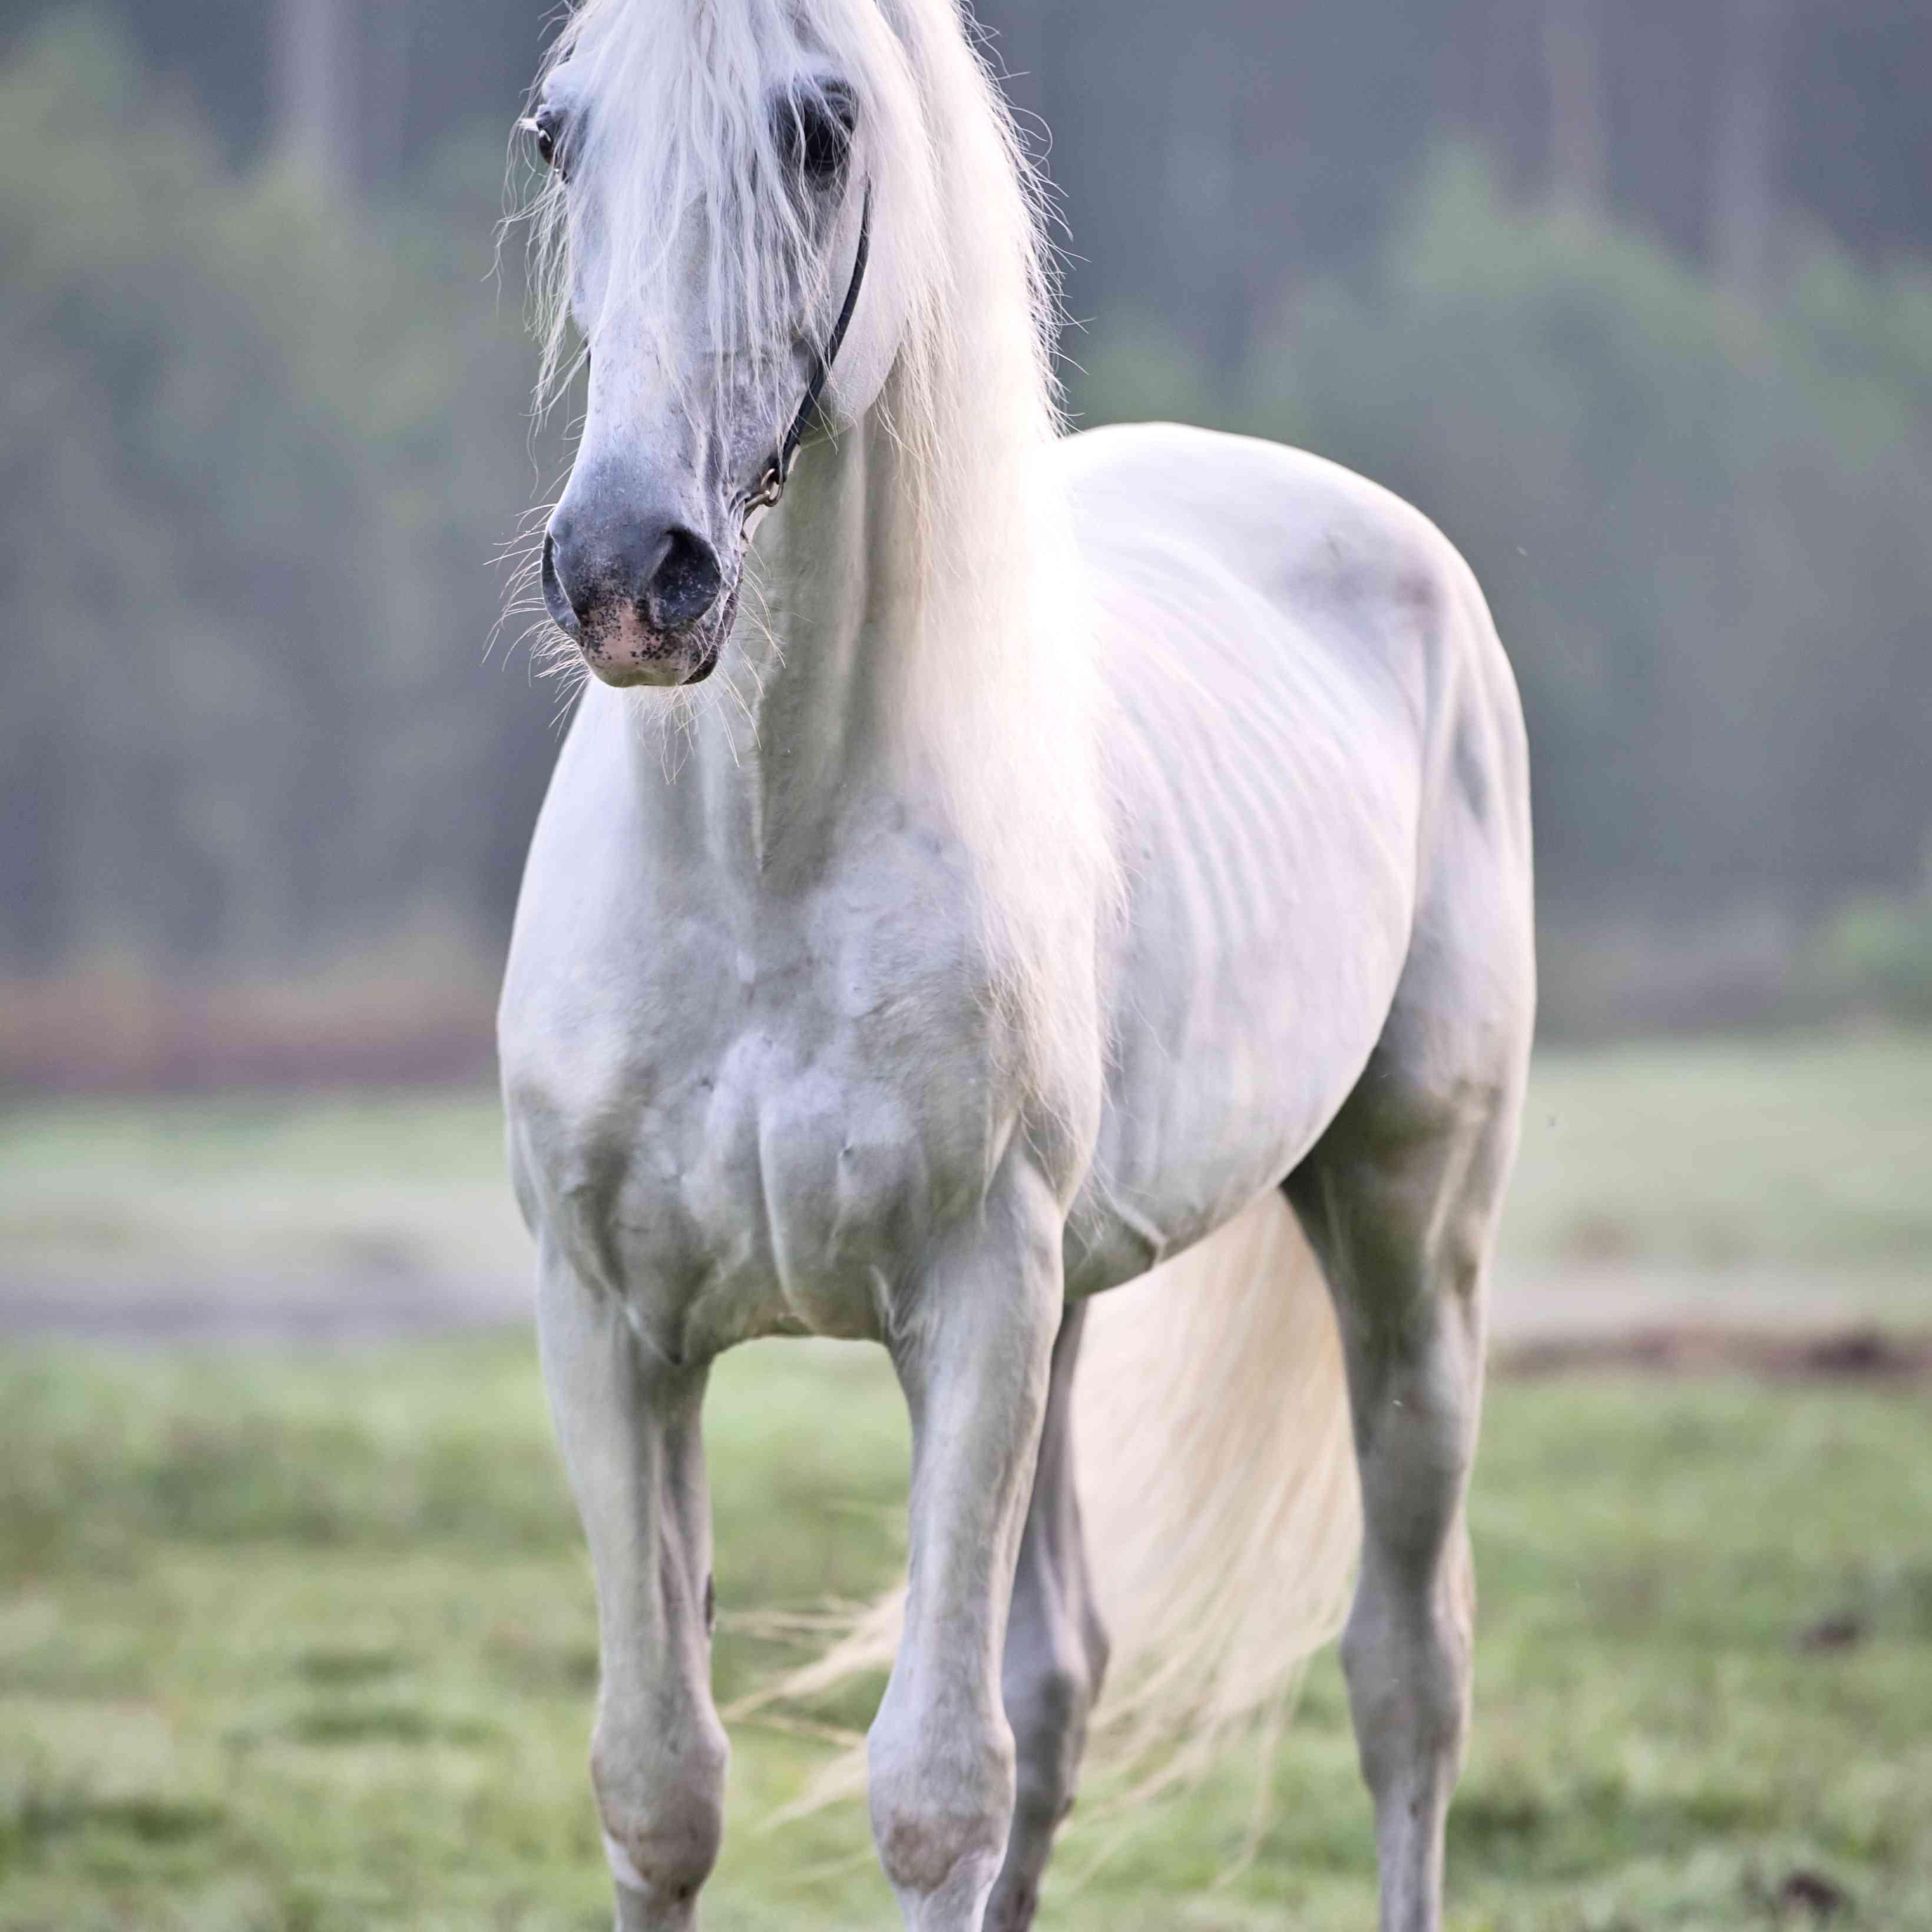 Grey Orlov Trotter in a field